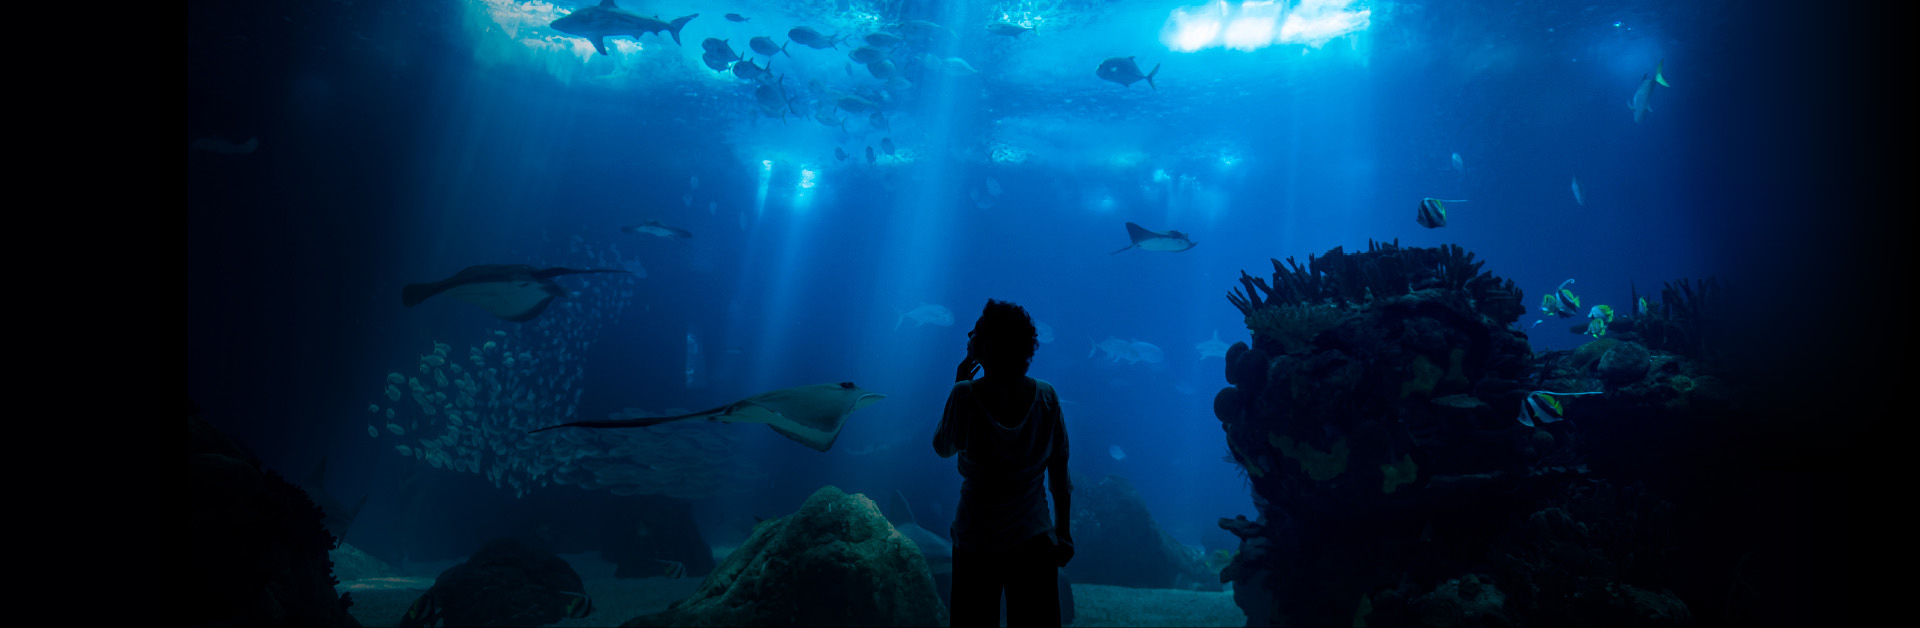 oceanario-de-lisboa-experiencia-para-quem-adora-animais